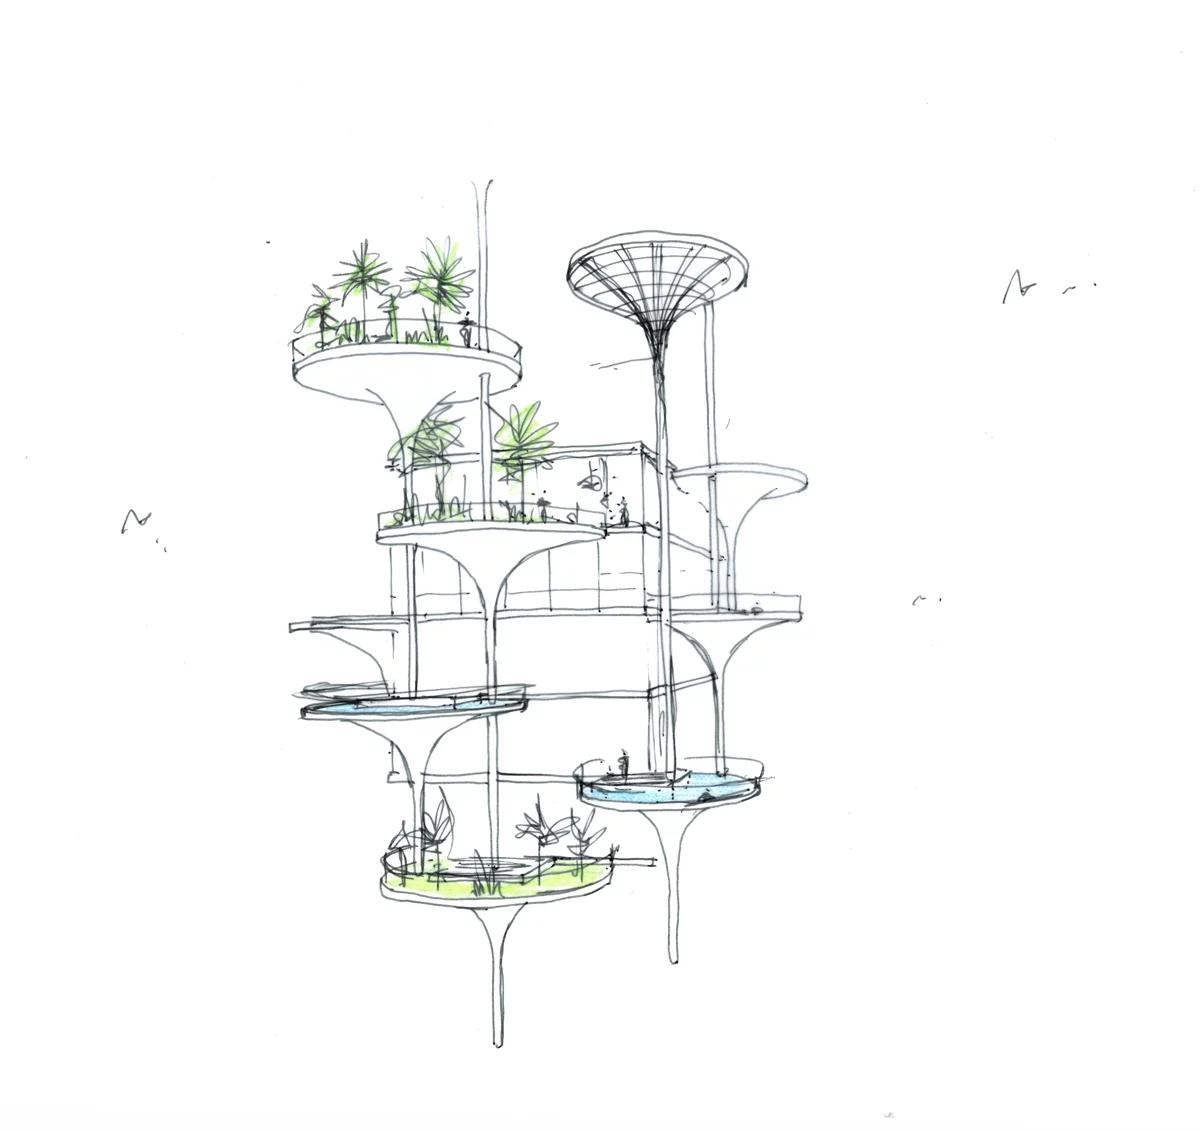 limmasol-tower-hamonic-masson-bastien-capon-cyprus-designboom-015.webp.jpg